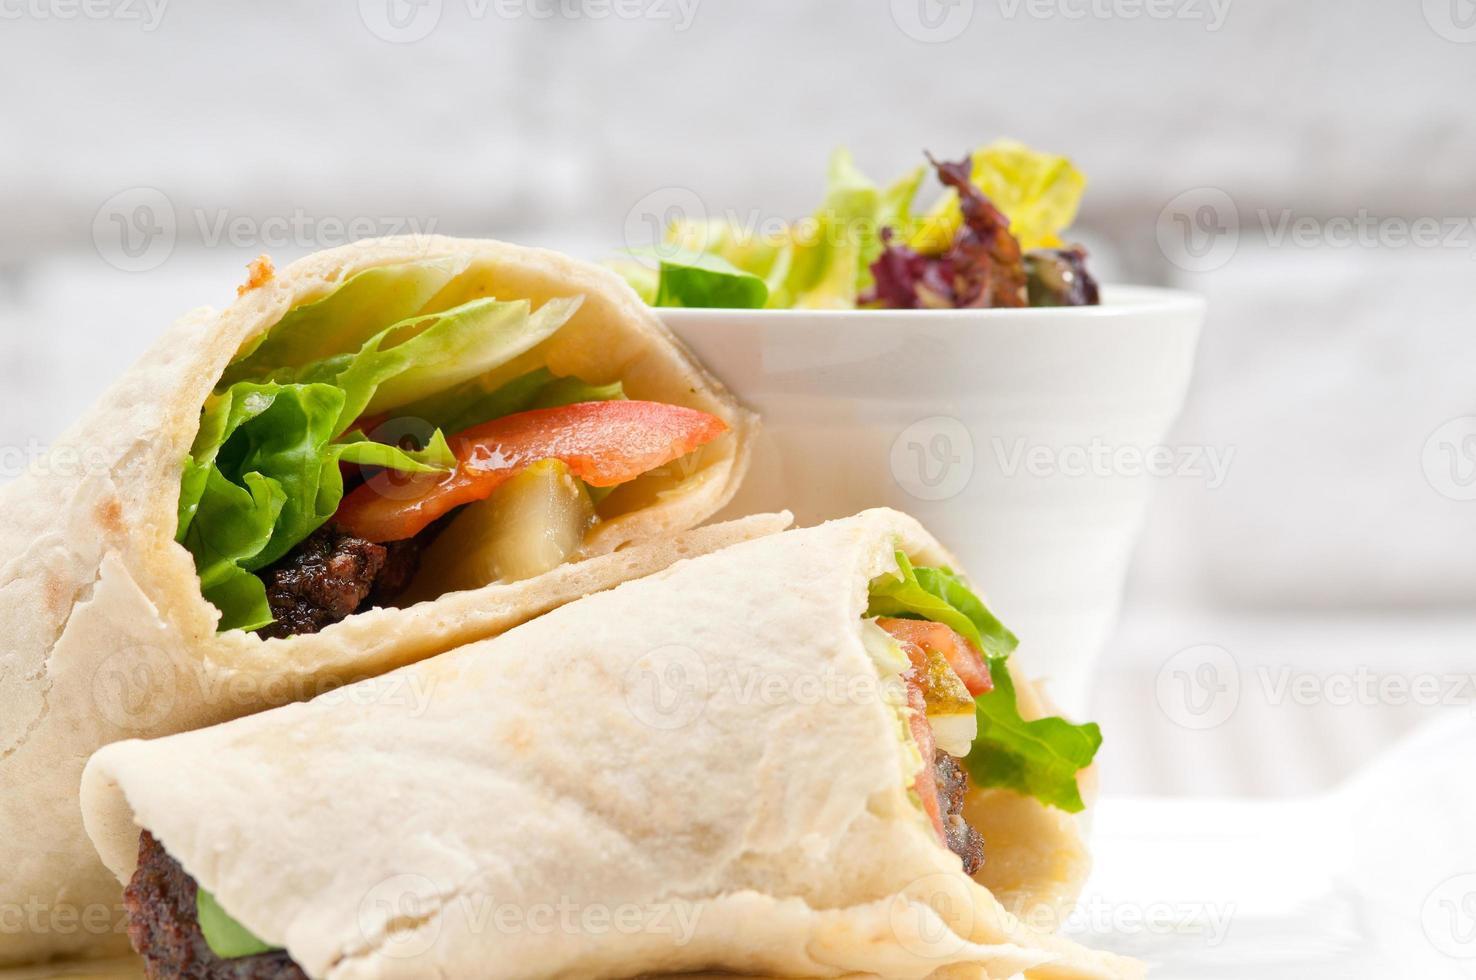 kafta shawarma frango pita envoltório rolo sanduíche foto